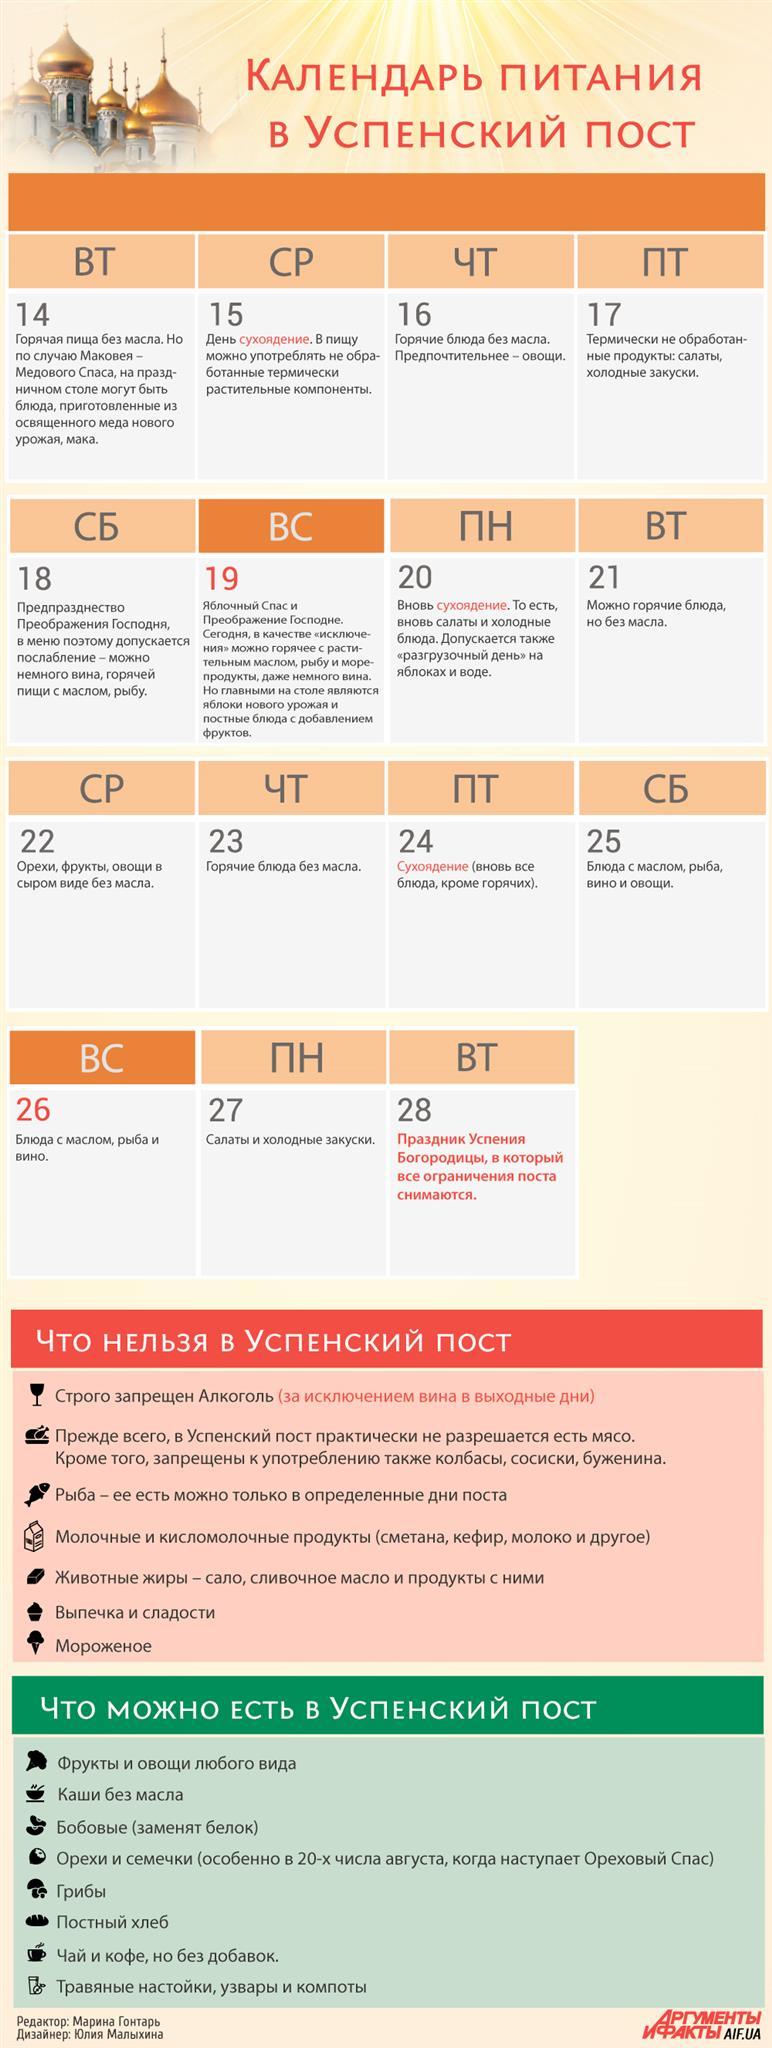 инфографика Успенский пост